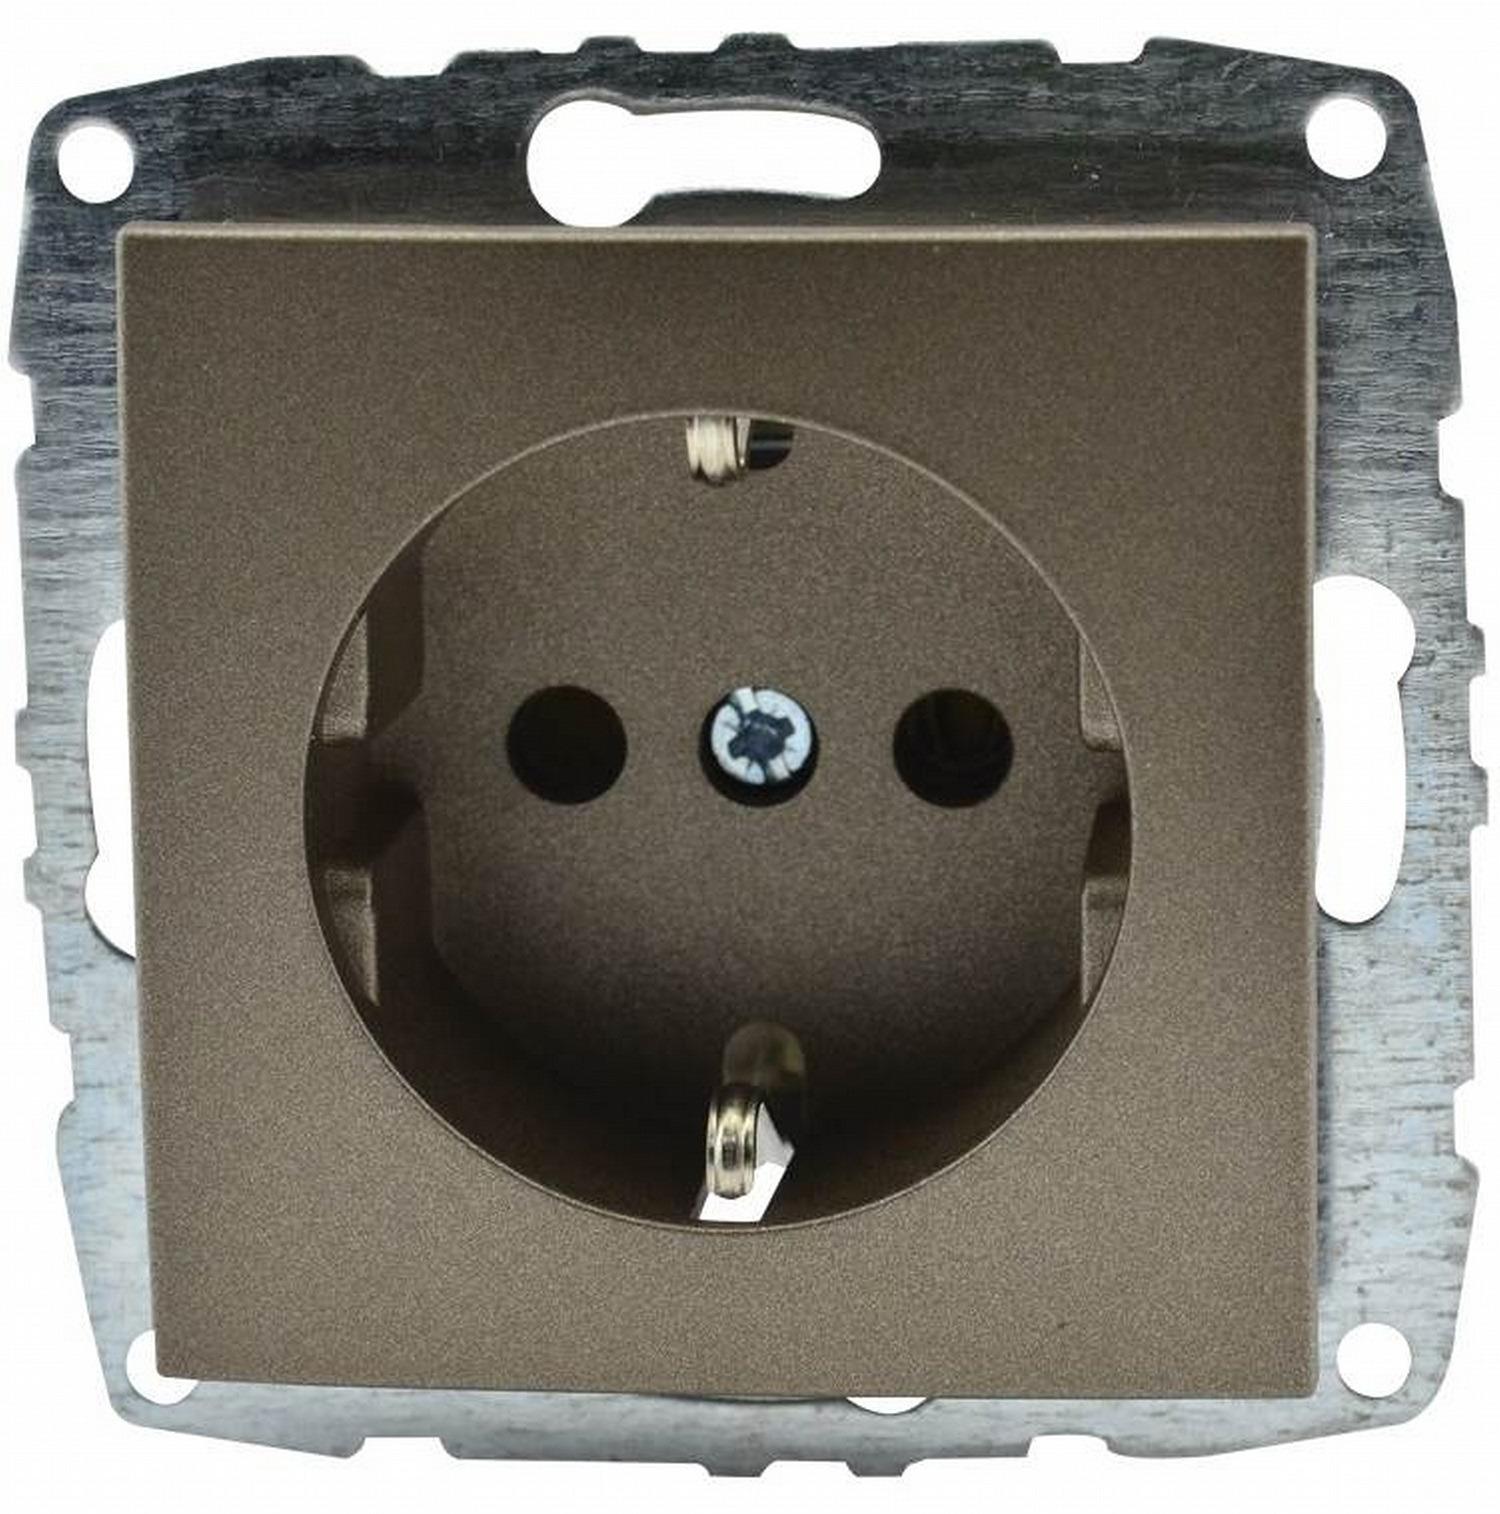 Розетка Mono D/L с заземлением бронза (механизм) 500-002321-117 фото